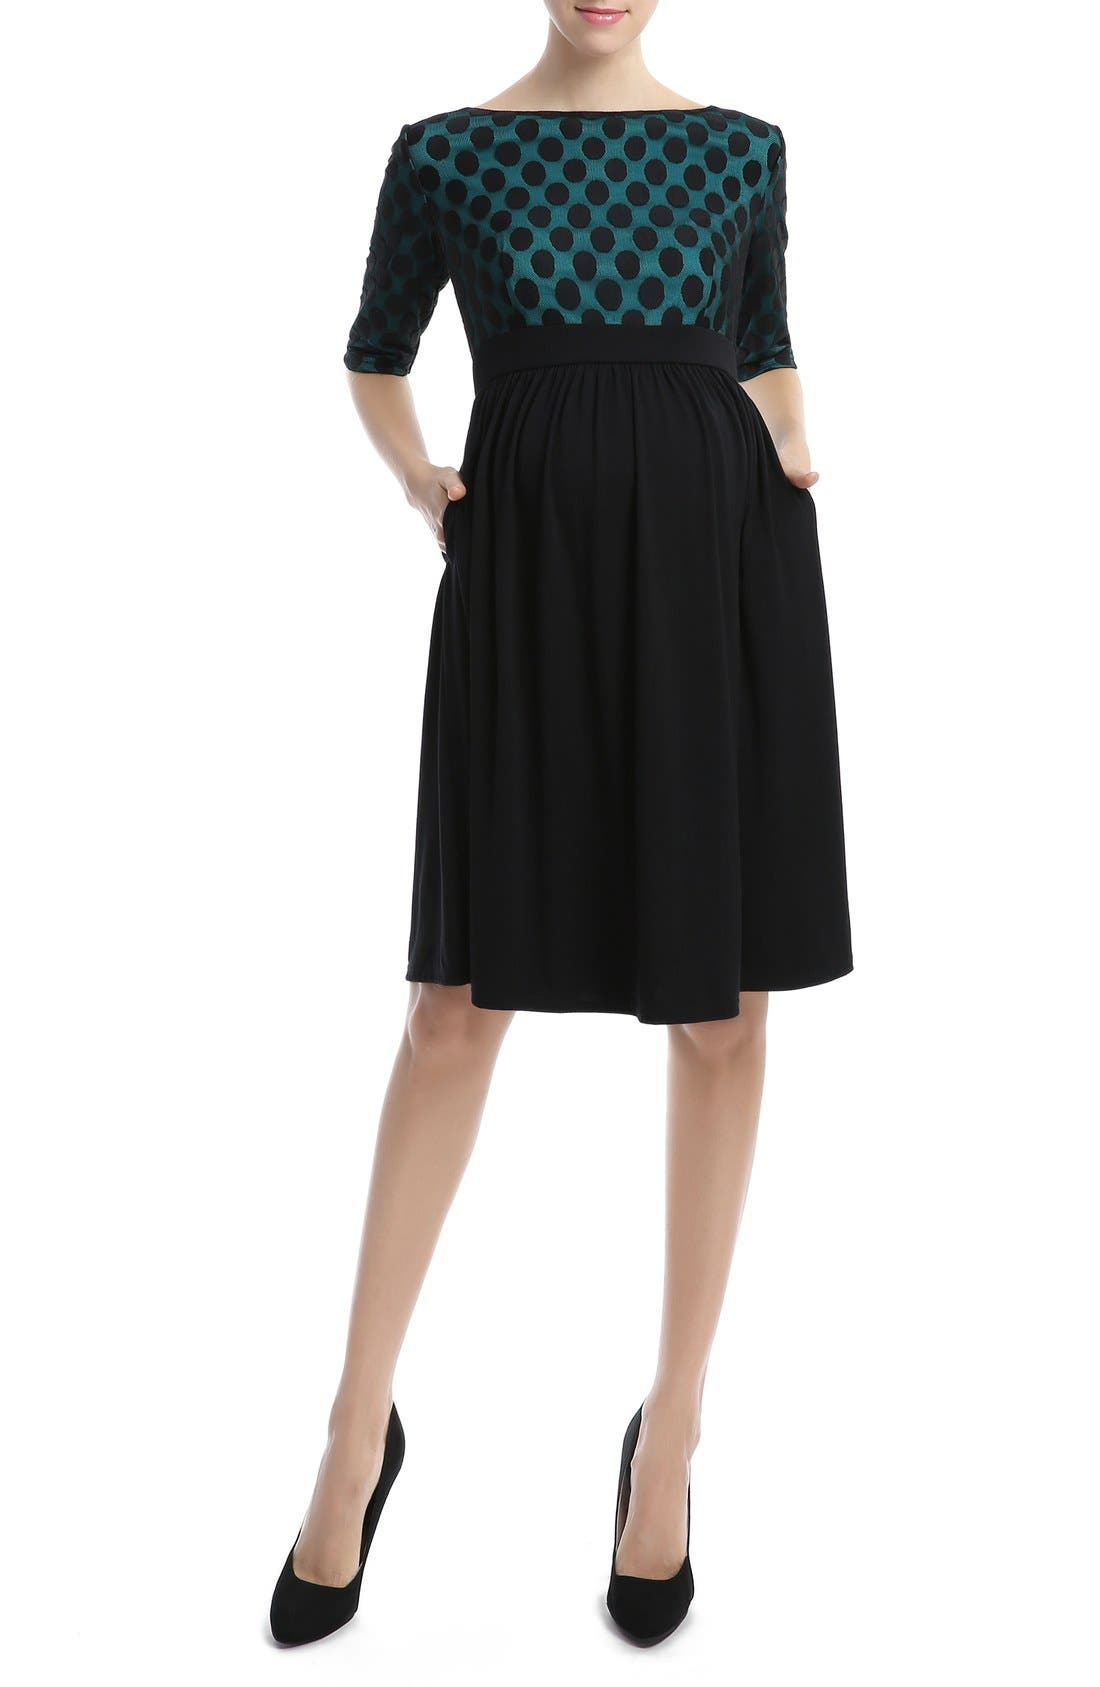 'Charlie' Maternity Dress,                         Main,                         color, Black/ Teal